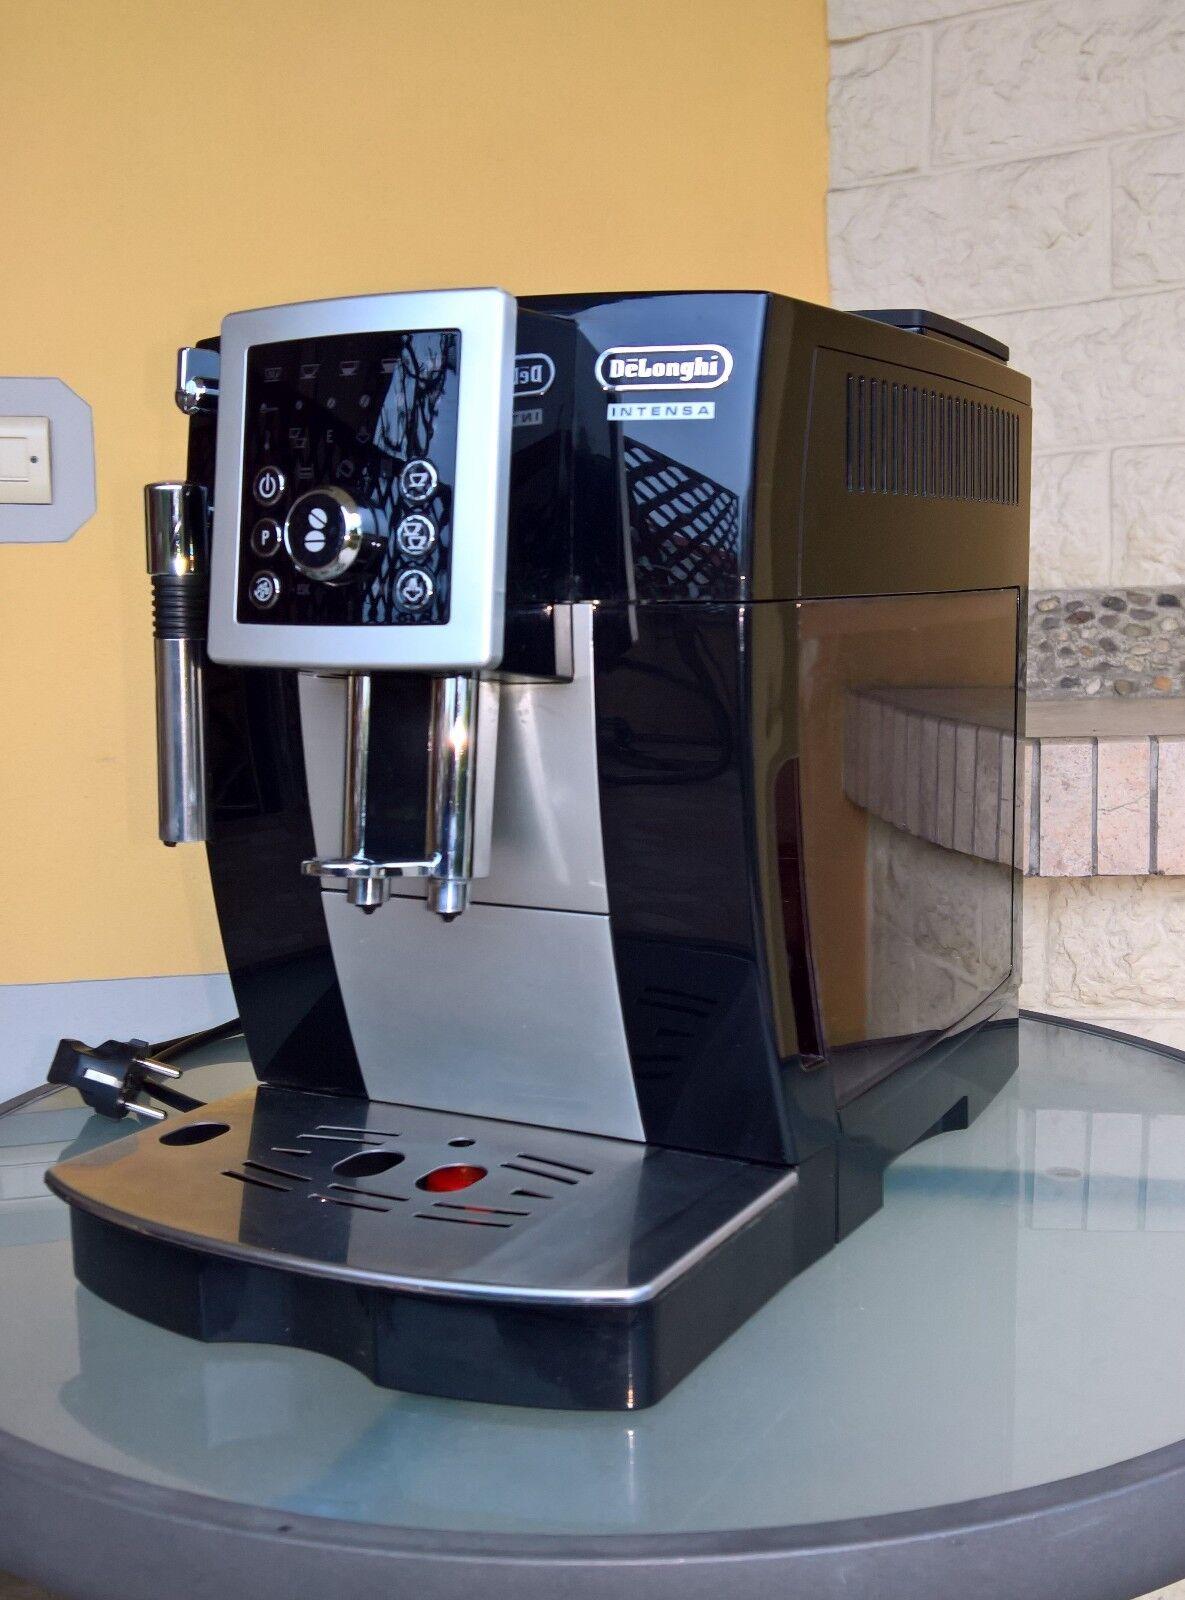 DeLonghi Ecam super automatica  De Longhi Macchina caffe espresso , saeco gaggia